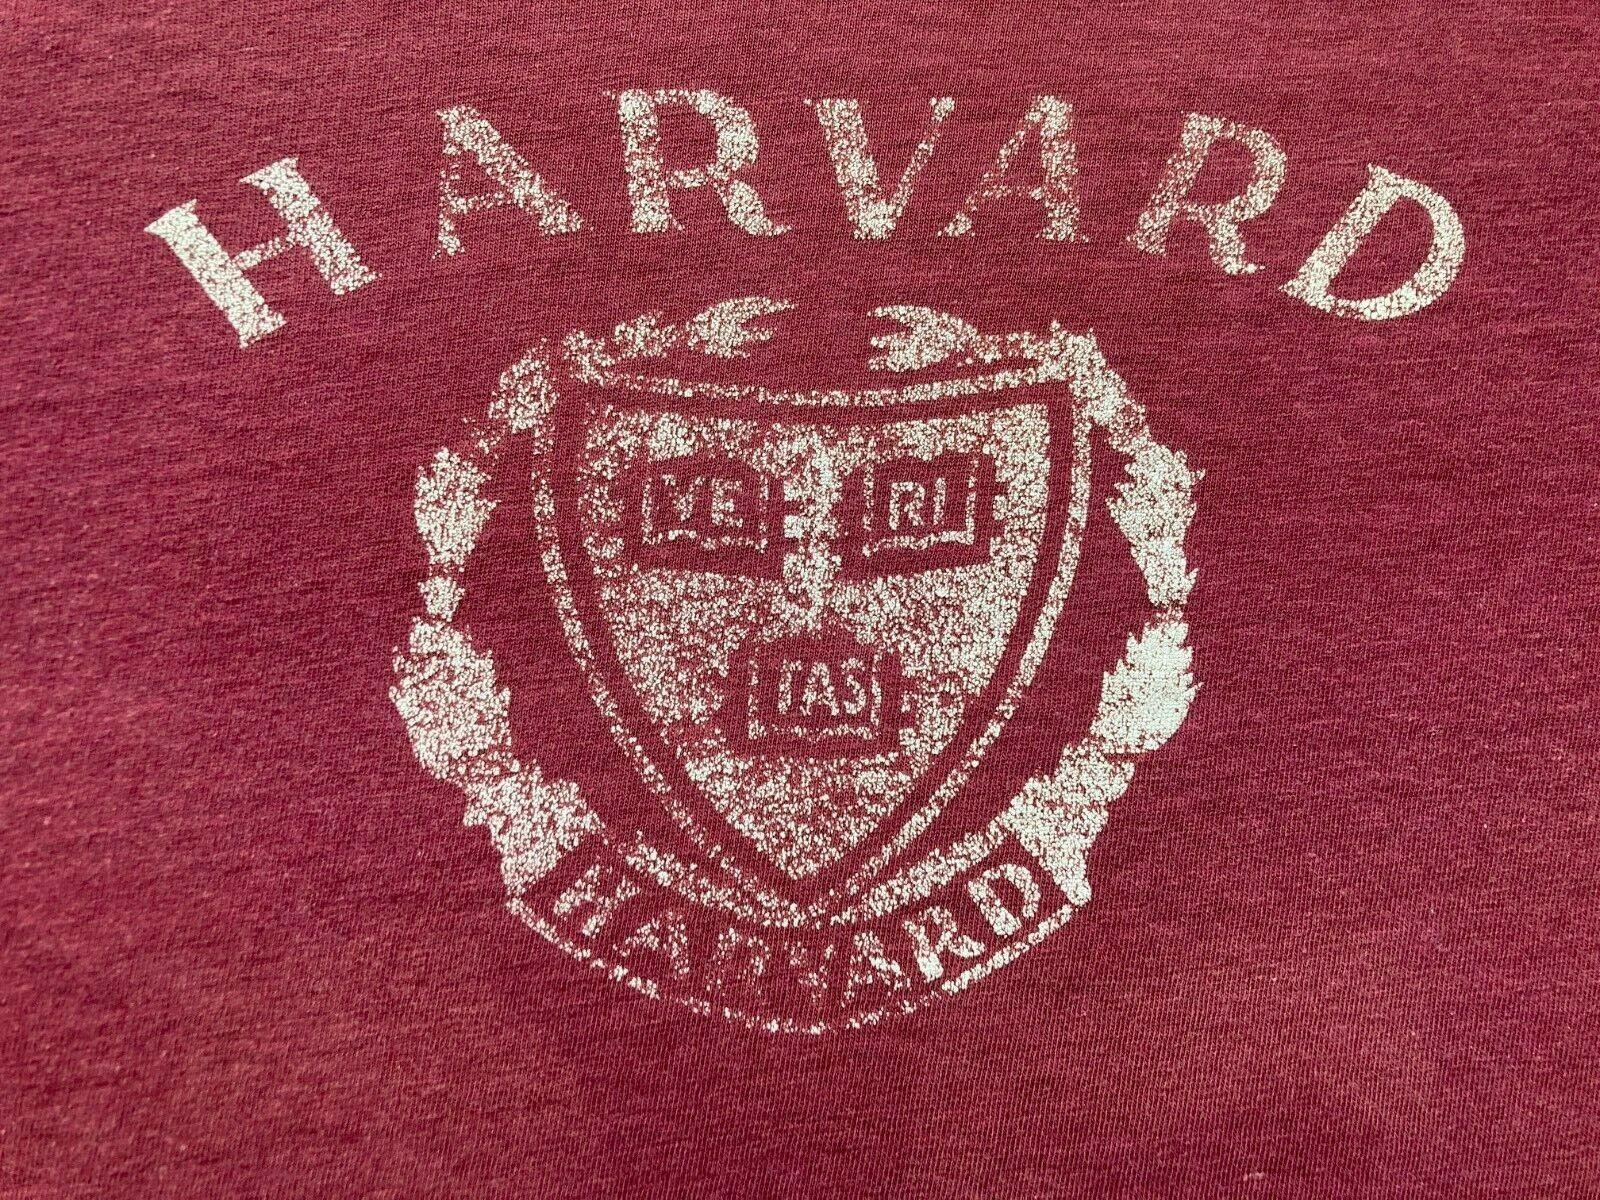 VINTAGE 70s/80s HARVARD UNIVERSITY CHAMPION T-SHI… - image 2